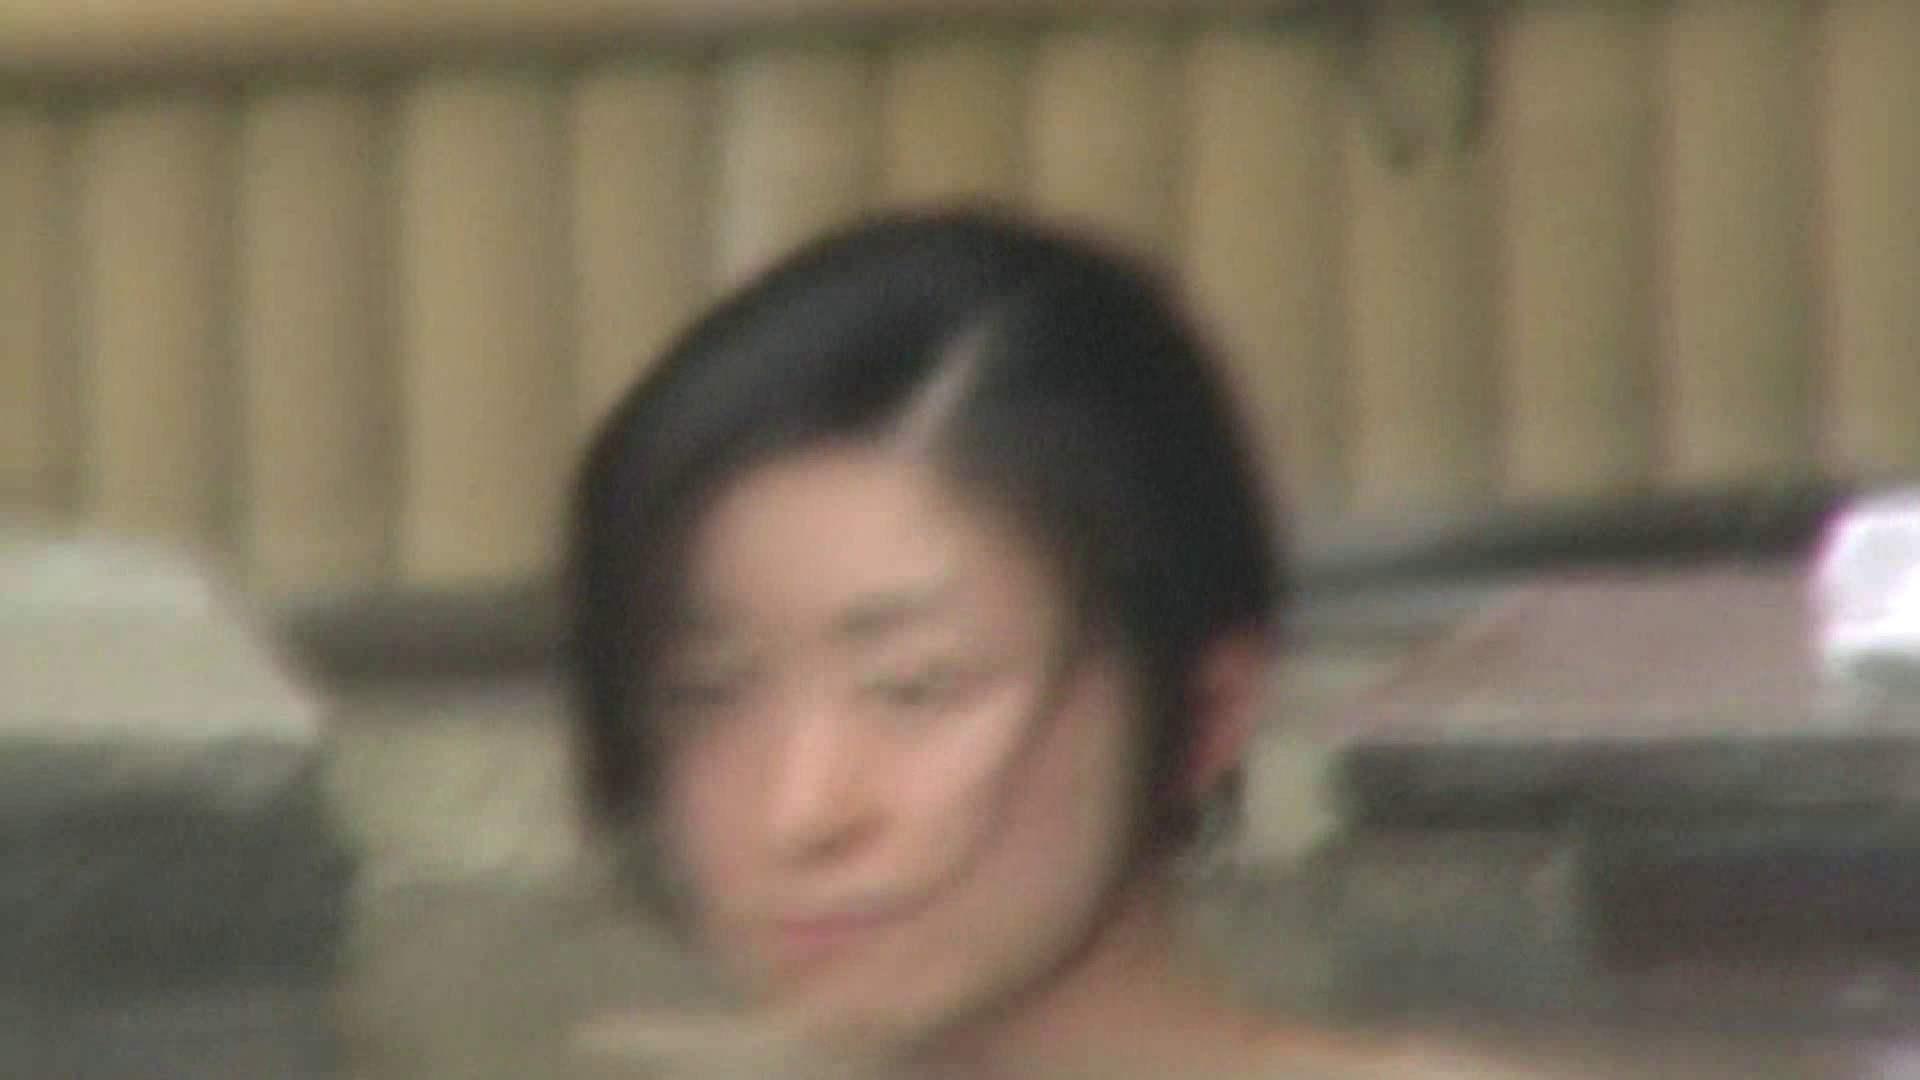 Aquaな露天風呂Vol.548 露天 覗きワレメ動画紹介 70連発 17